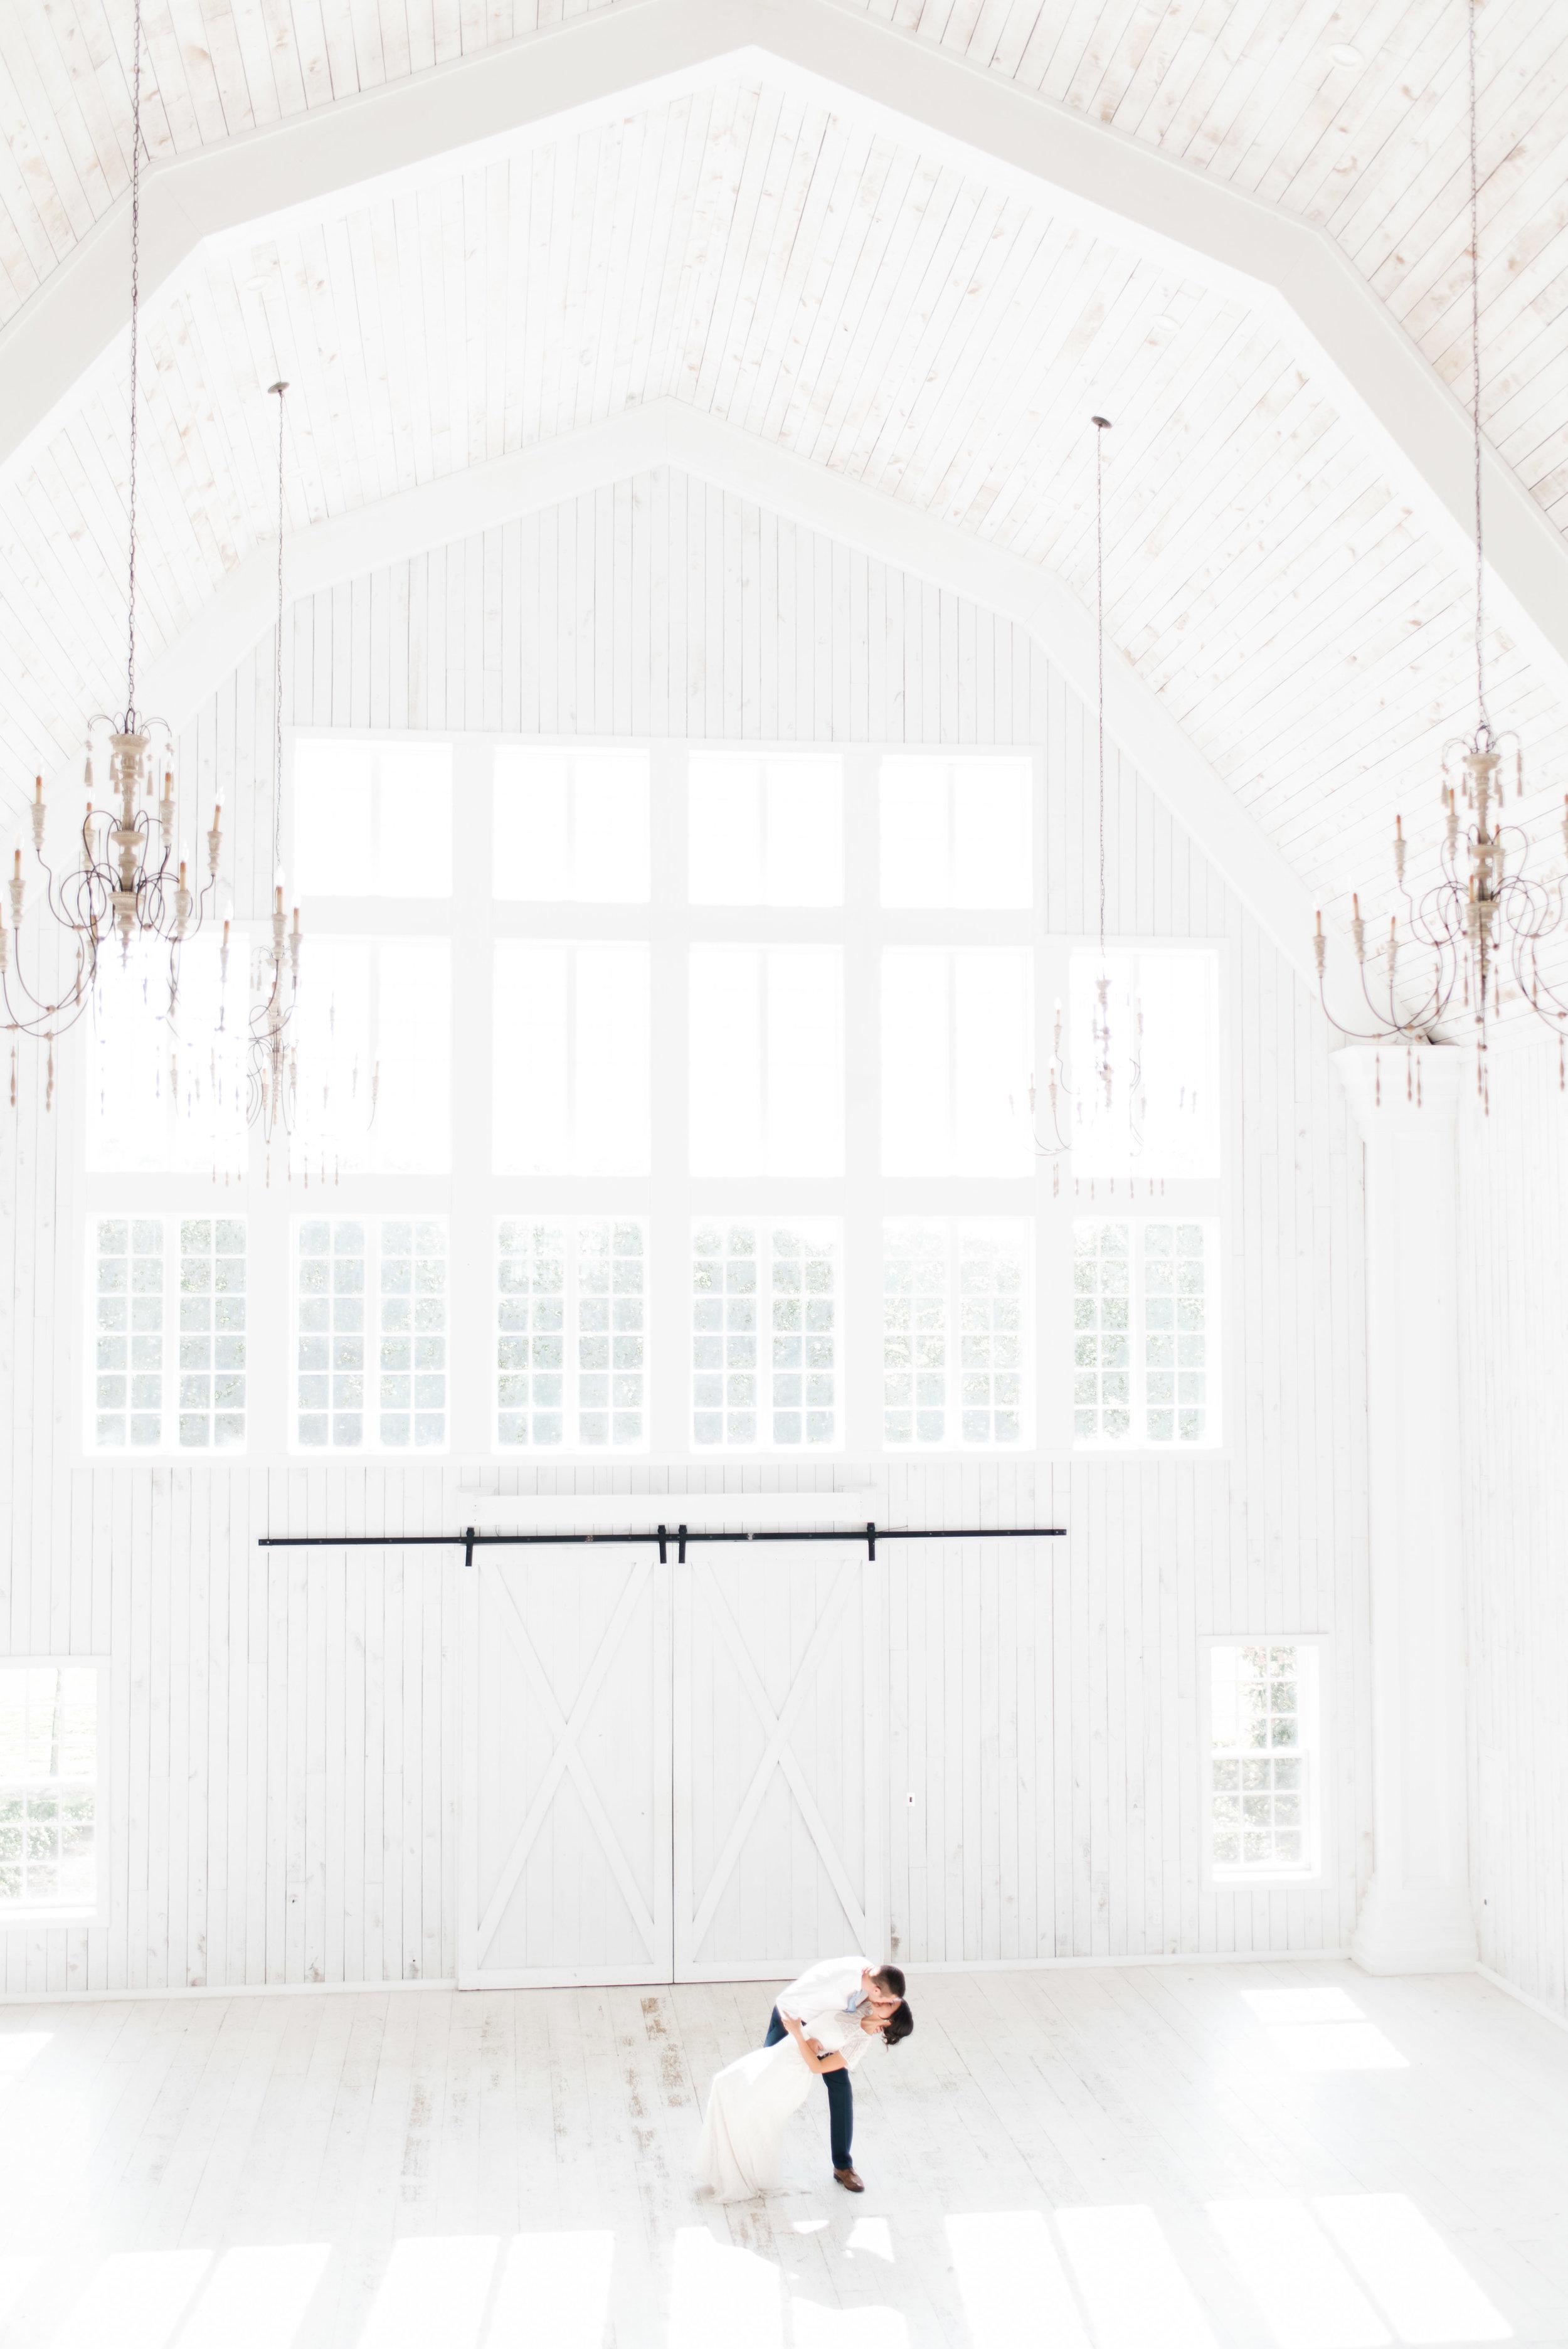 gray-door-photography-wedding-photographer-steph-erffmeyer-dallas-destination30.jpg